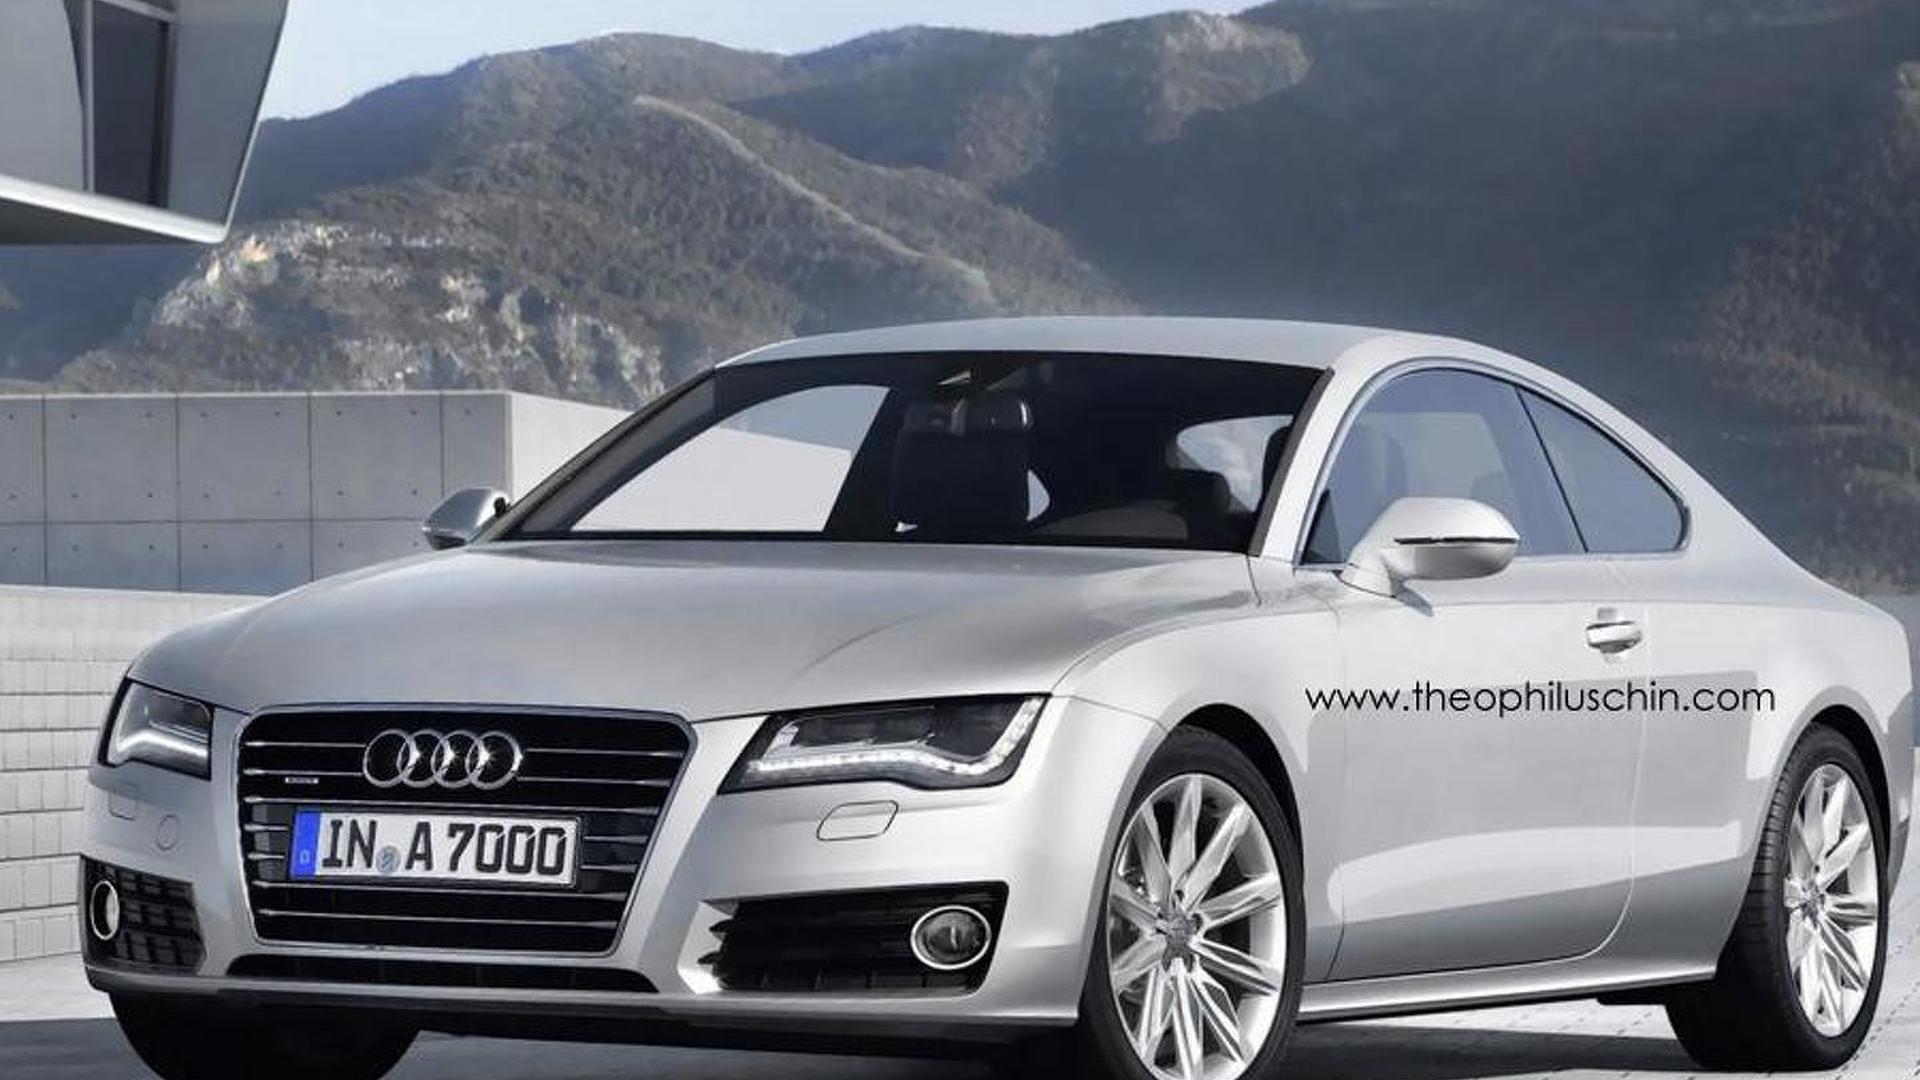 Kelebihan Audi A7 Coupe Top Model Tahun Ini